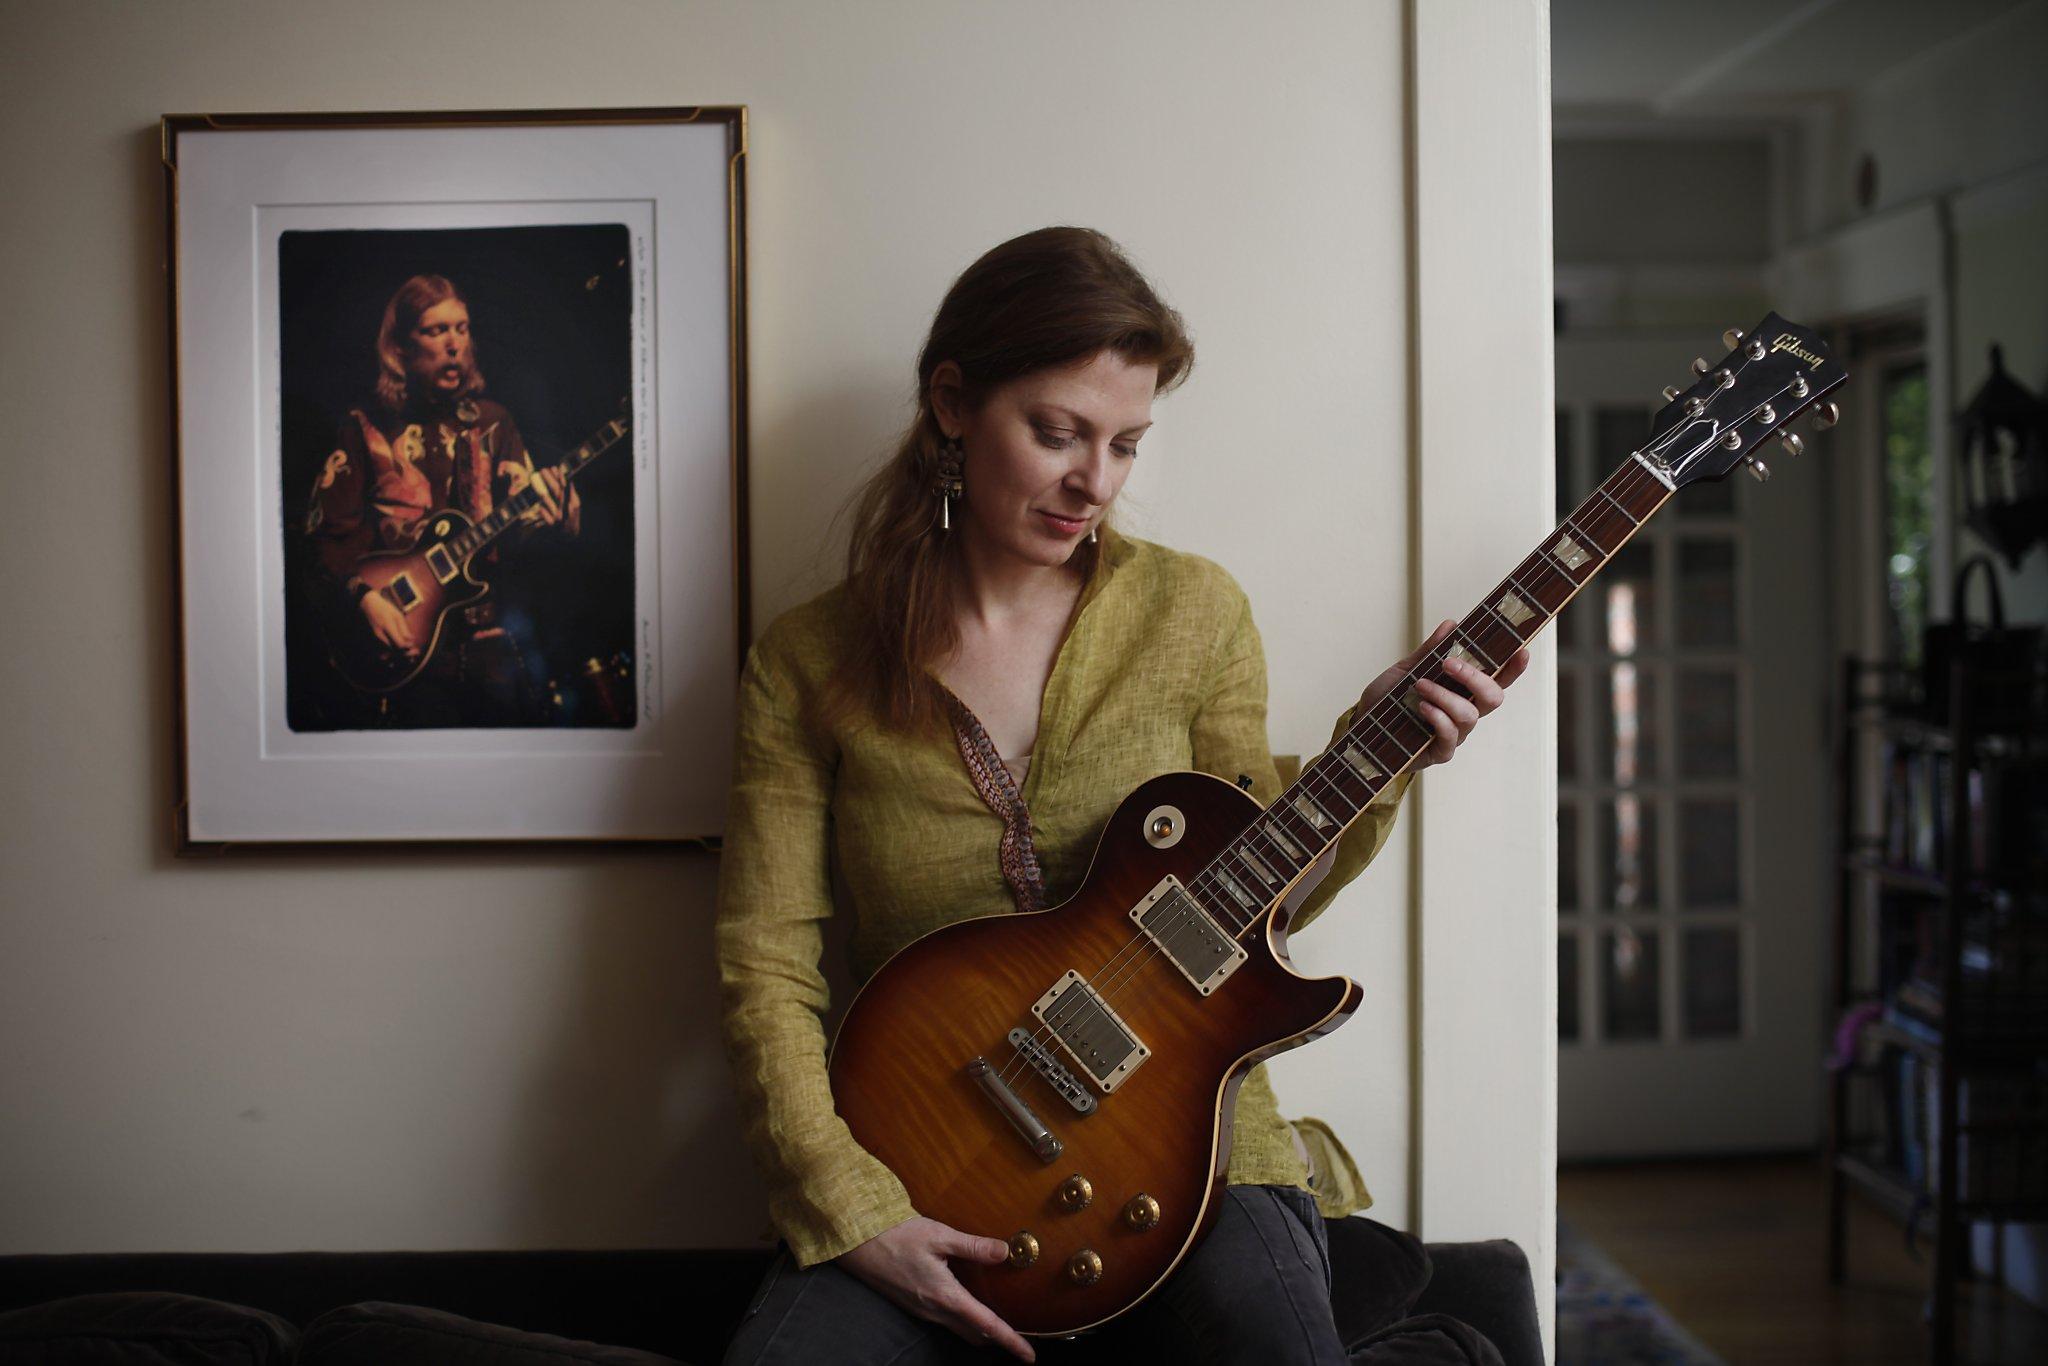 Pin on Allman brothers band  |Donna Duane Allman